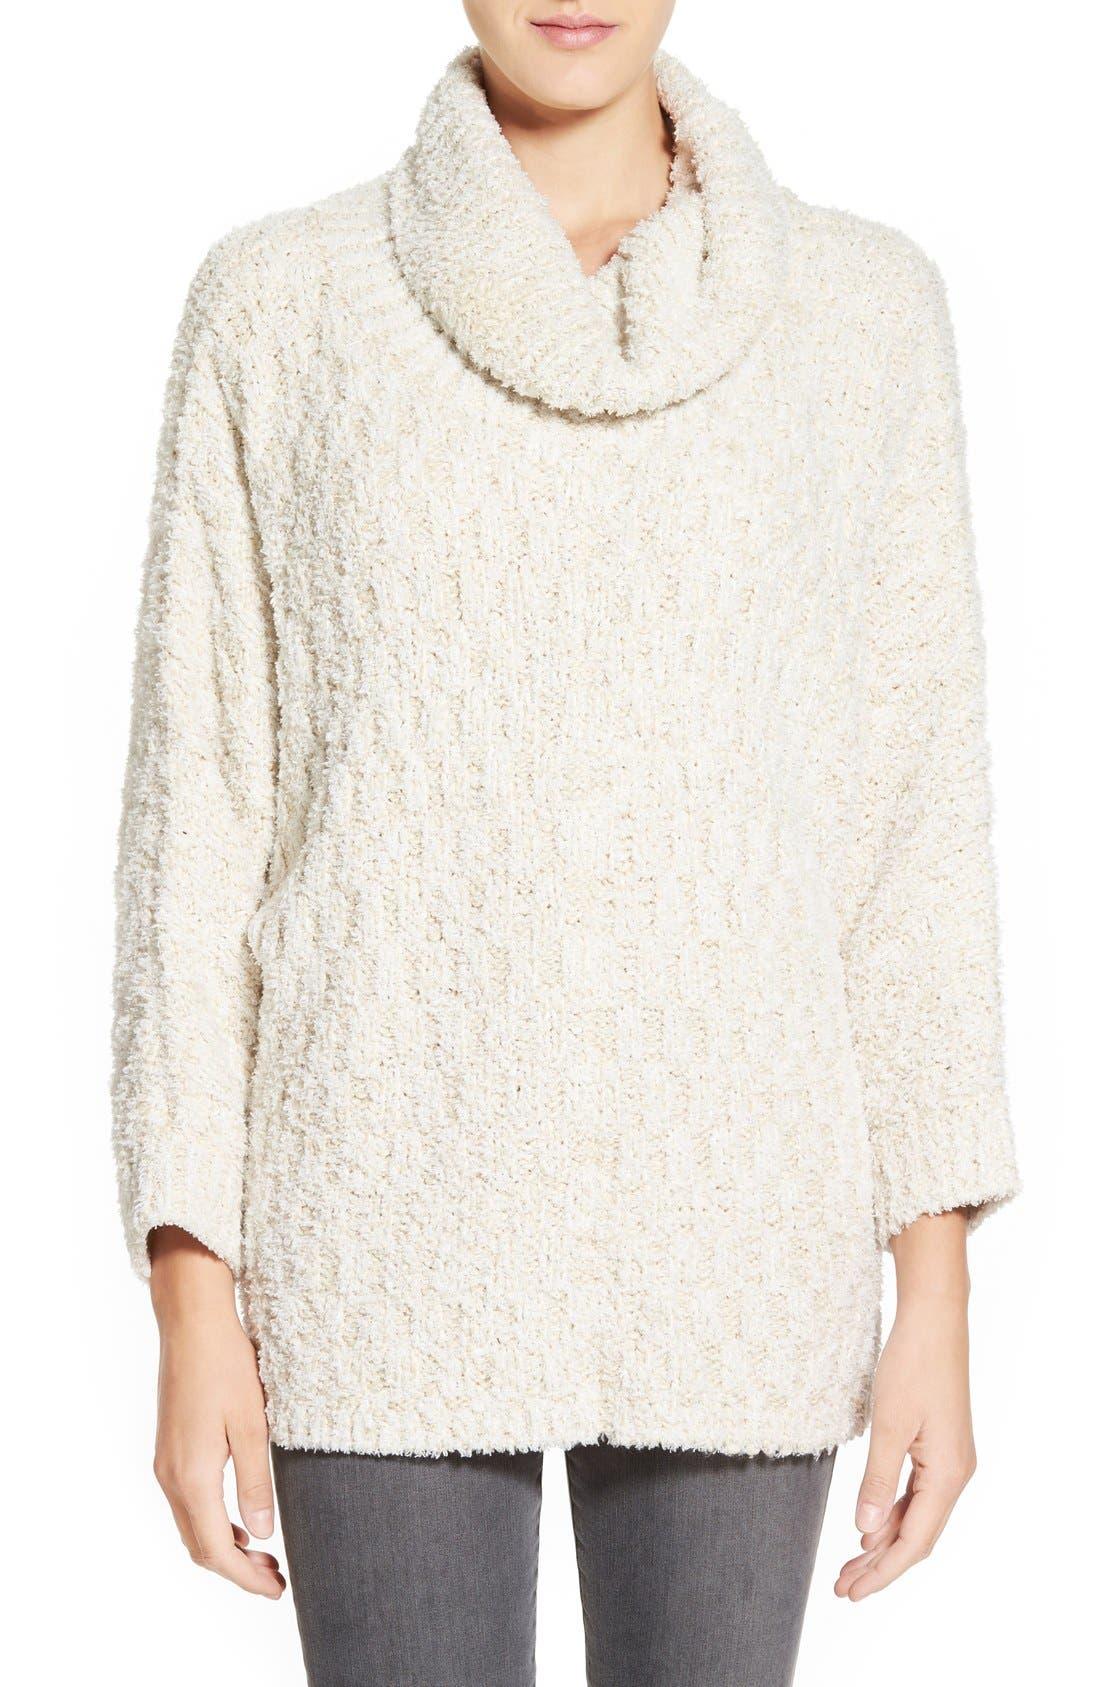 Main Image - Chelsea28 Fluffy Turtleneck Sweater